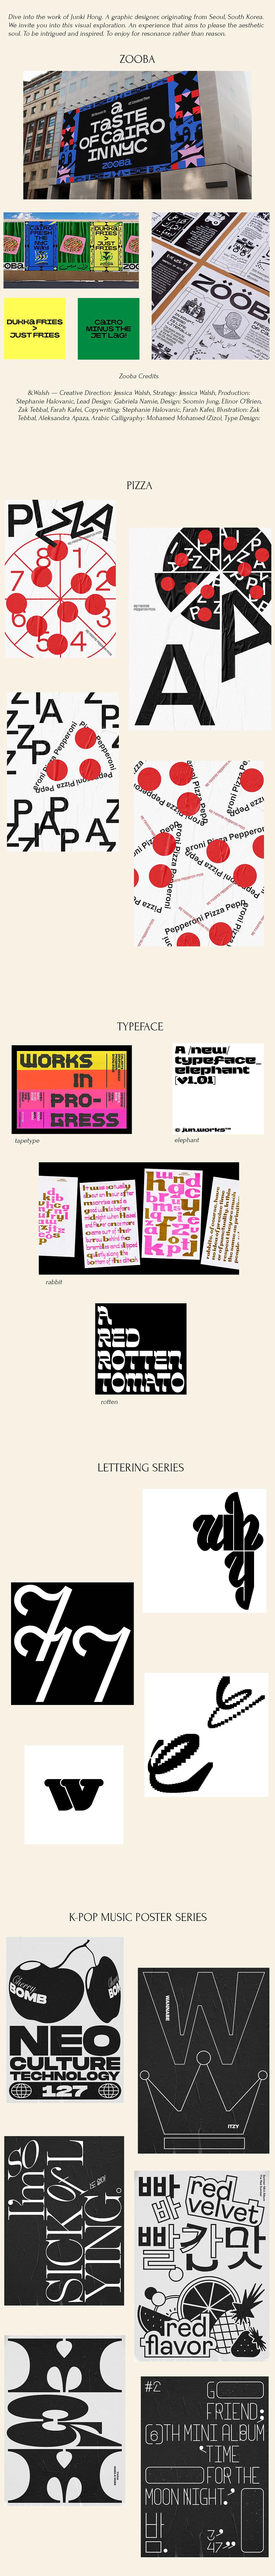 blurb magazine. blurbmag. Exploration of design, @Jun.works. Junki Hong. Arts and Culture. @blurb.mag